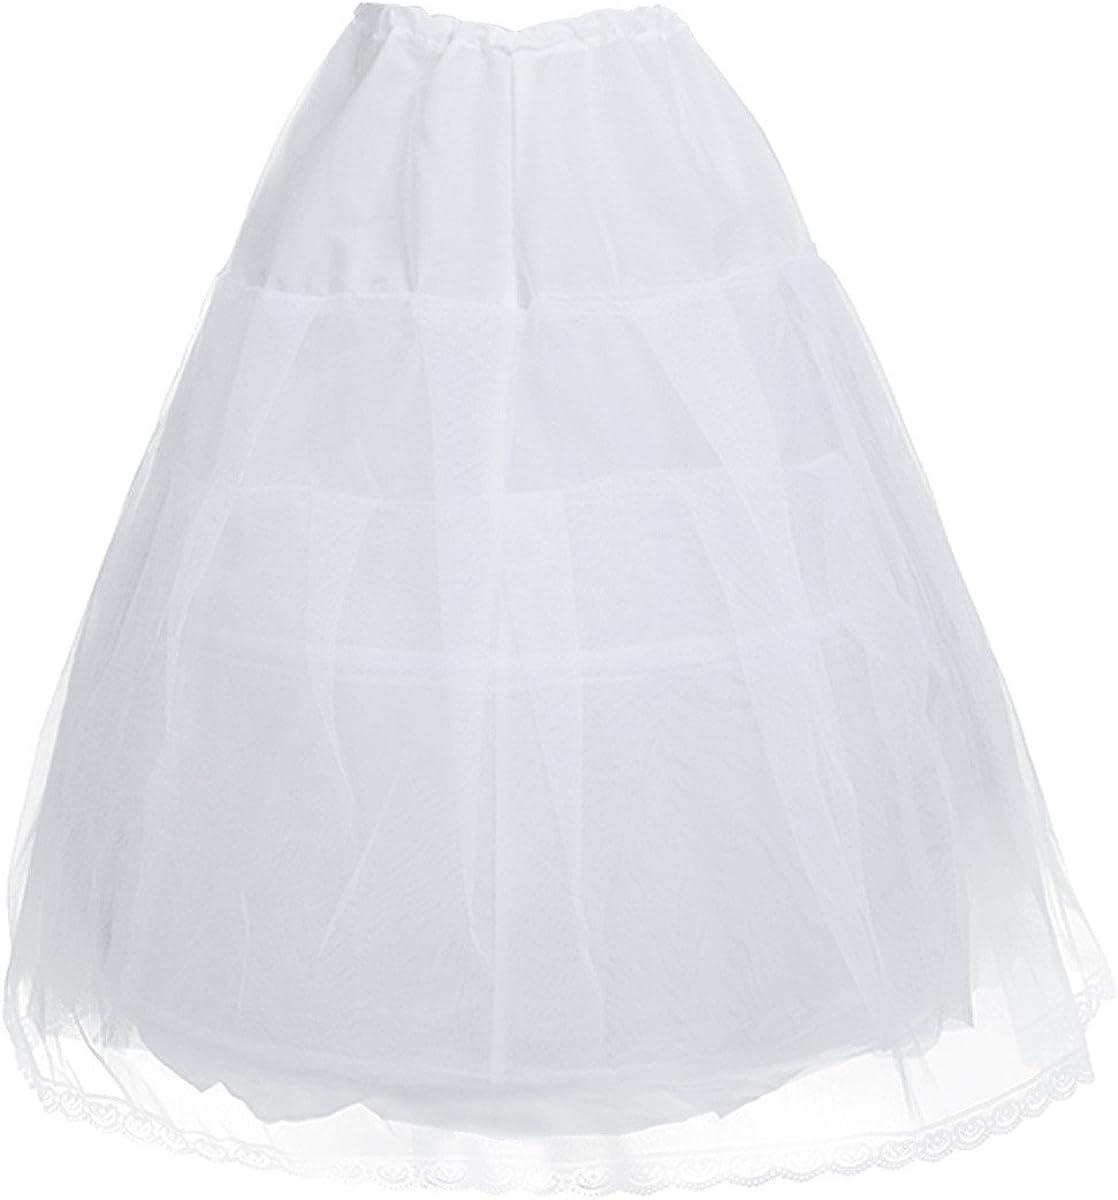 TiaoBug Kids Girls Vintage Rockabilly 2 Hoop Crinoline Hoopless Petticoat Full Slip Flower Tutu Dress 1950s Underskirt